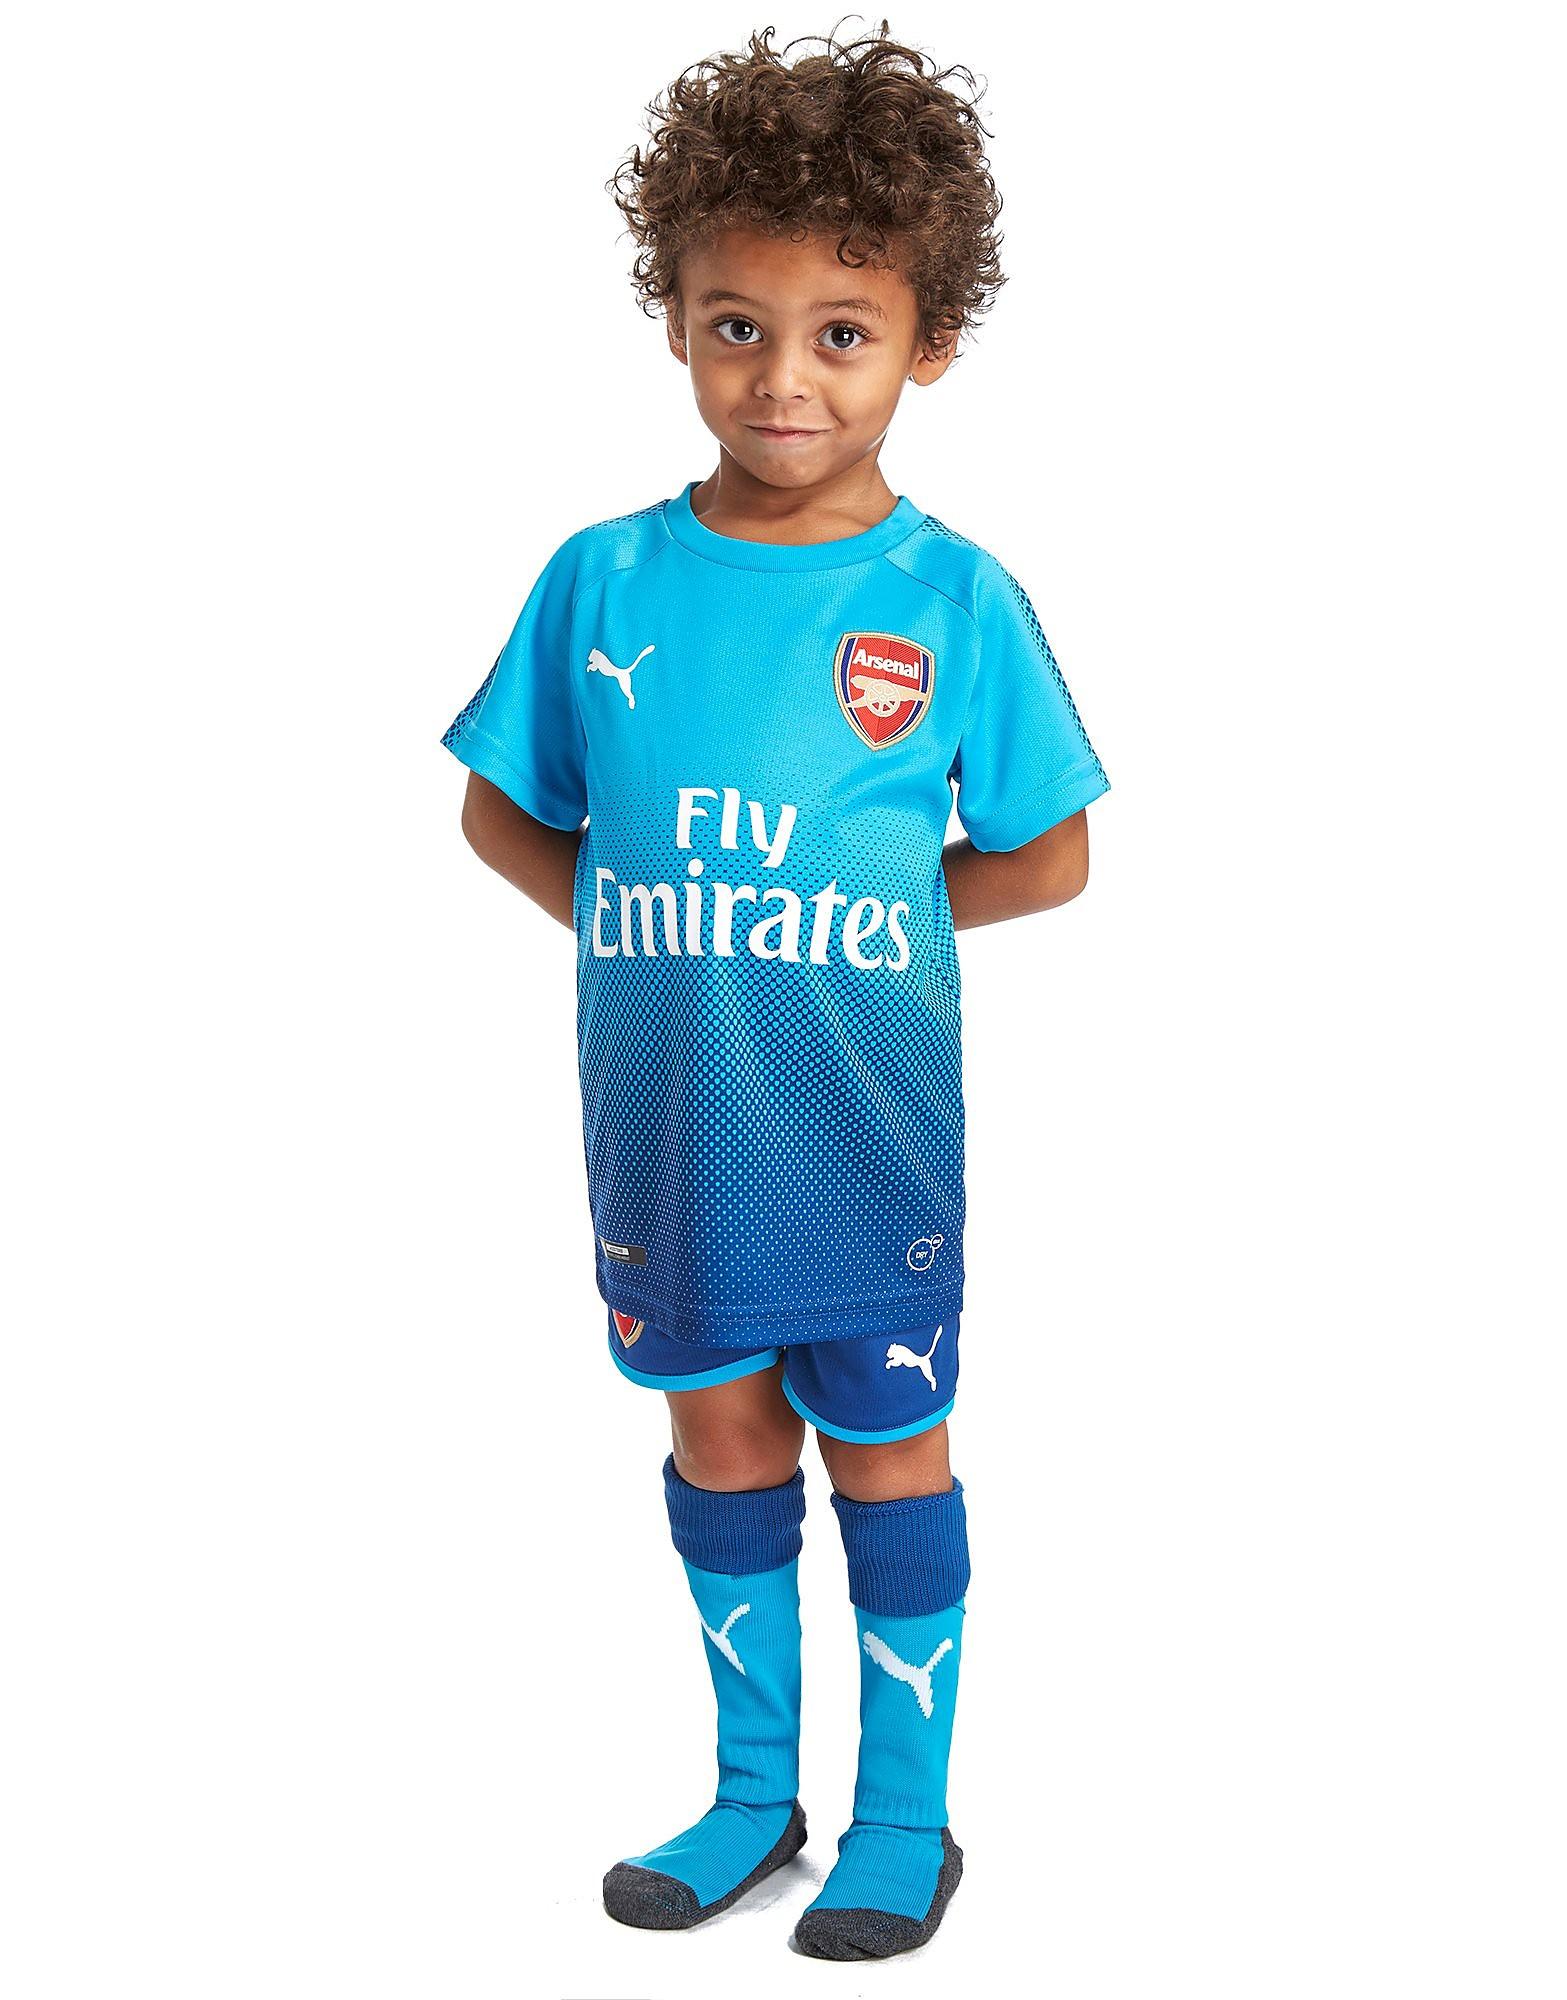 PUMA Arsenal FC 2017/18 Away Kit